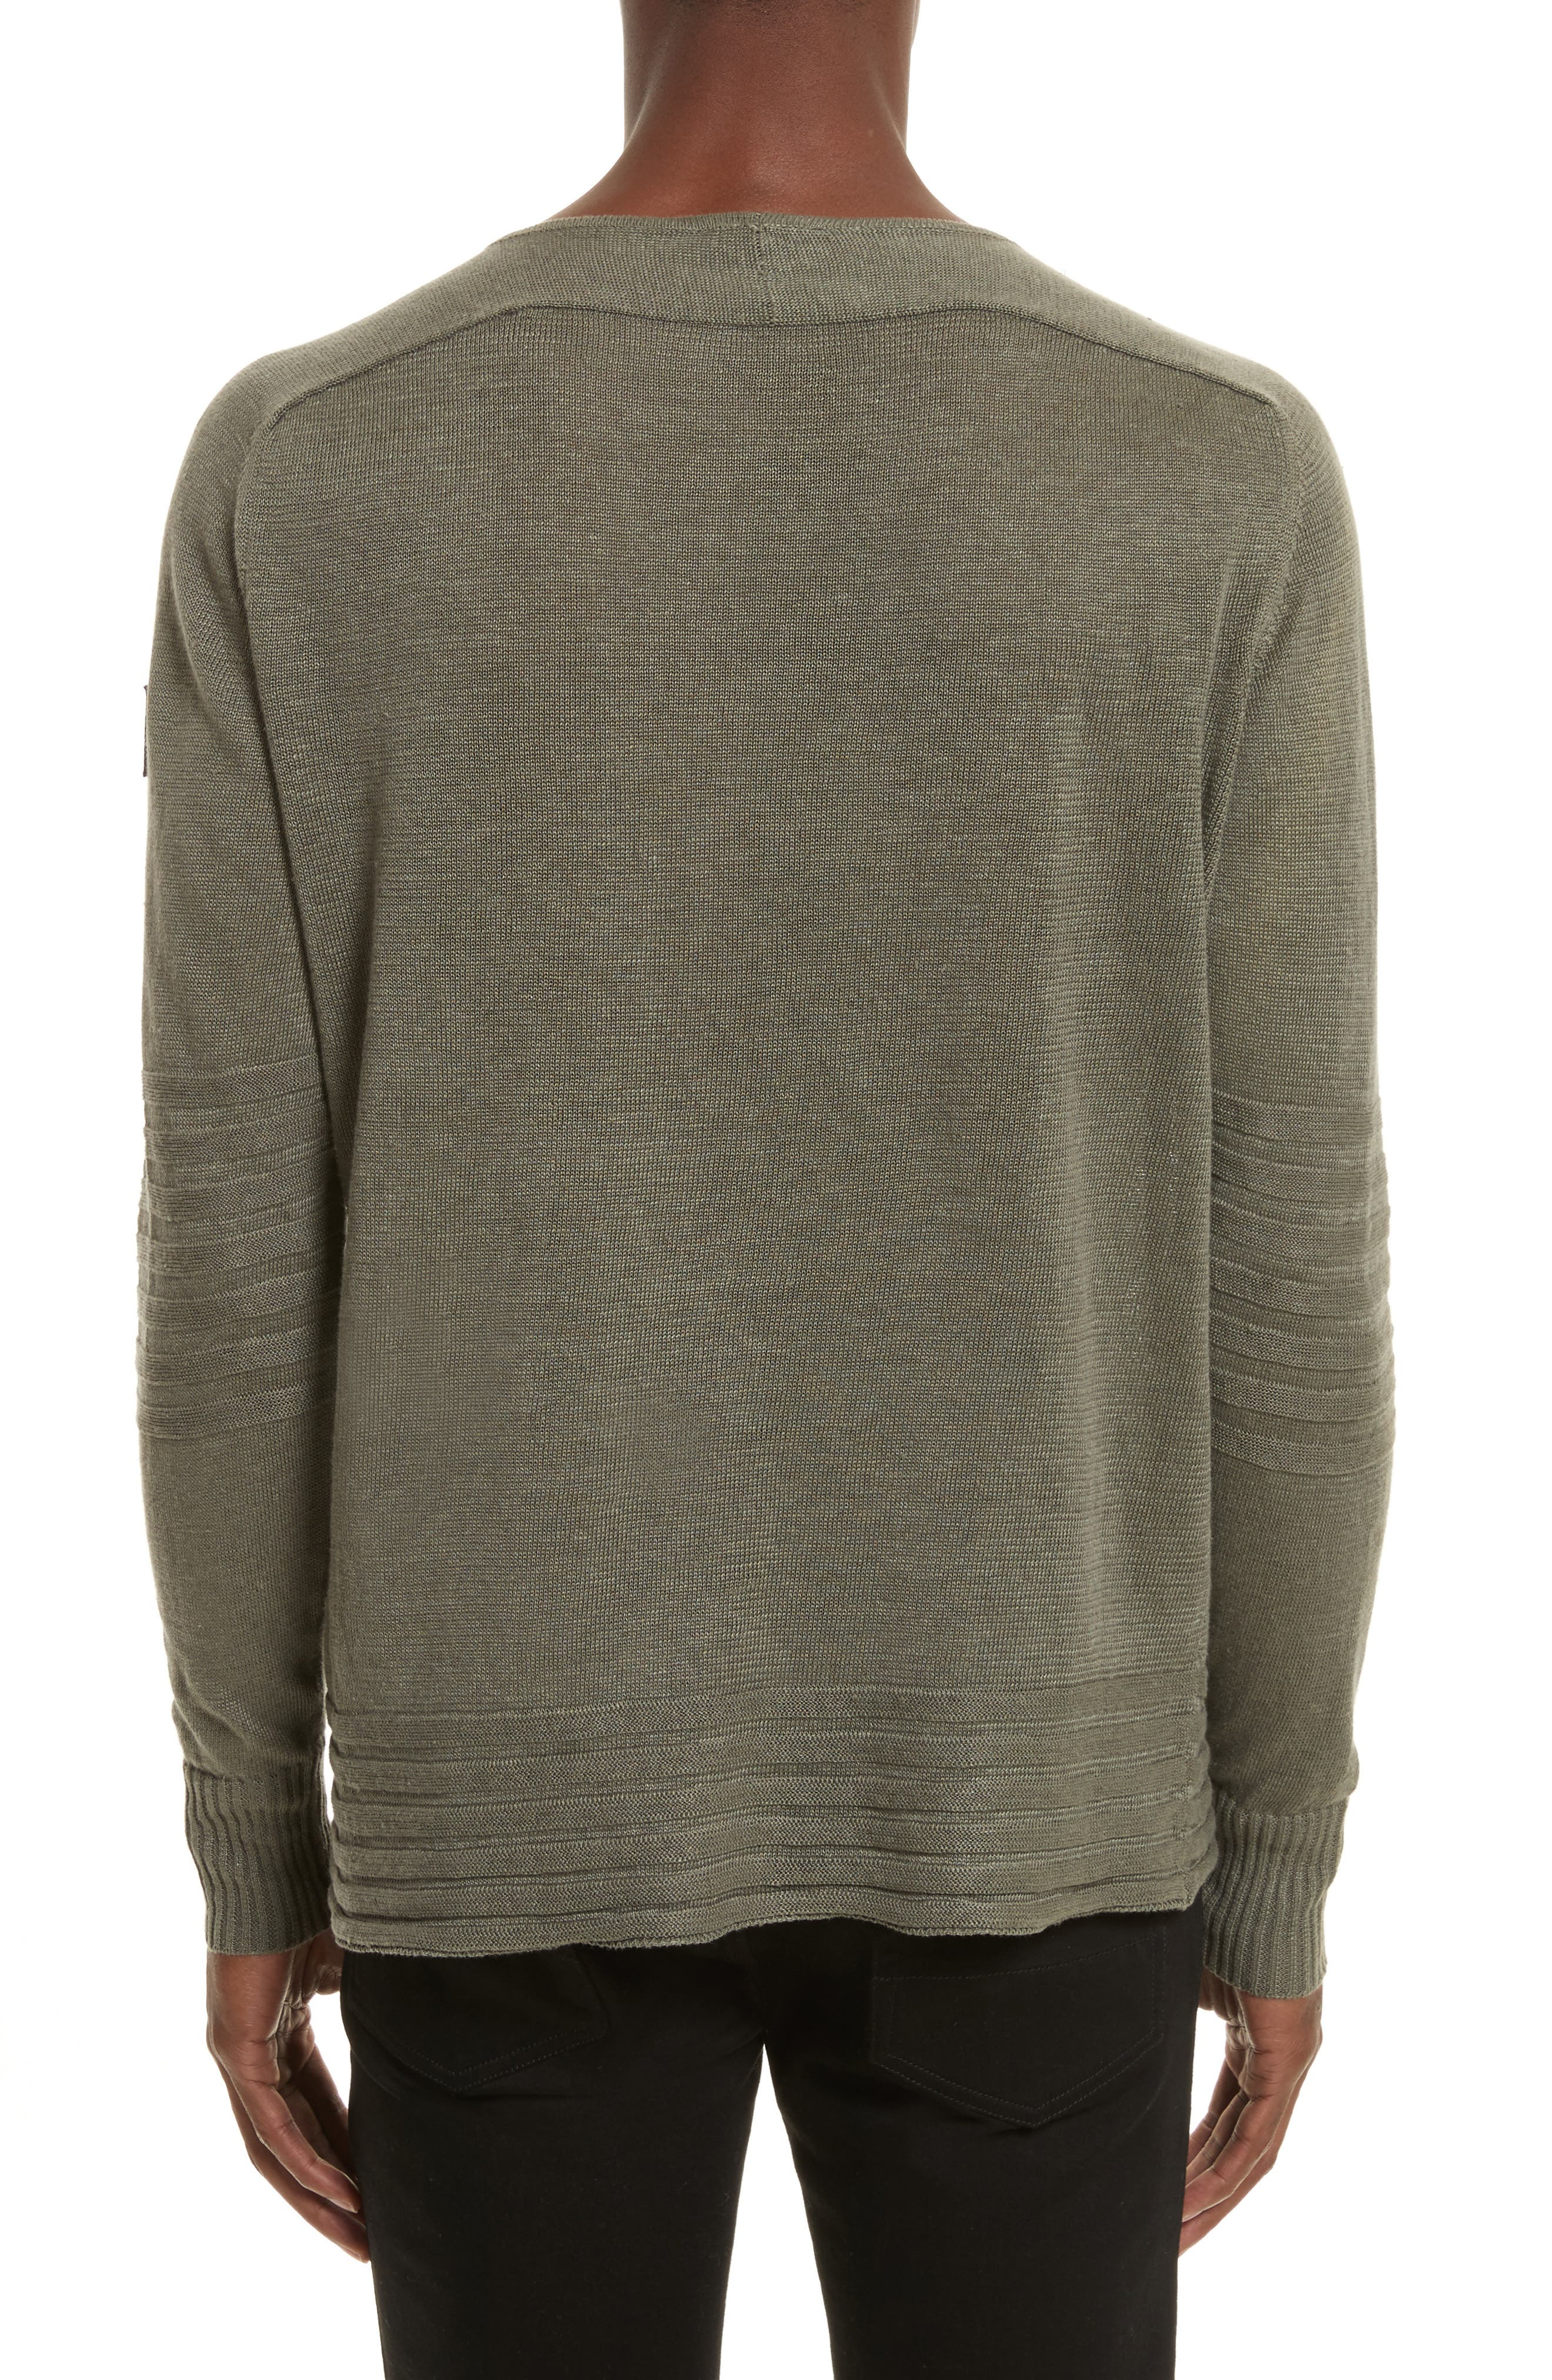 Exford Linen Crewneck Sweater,                             Alternate thumbnail 4, color,